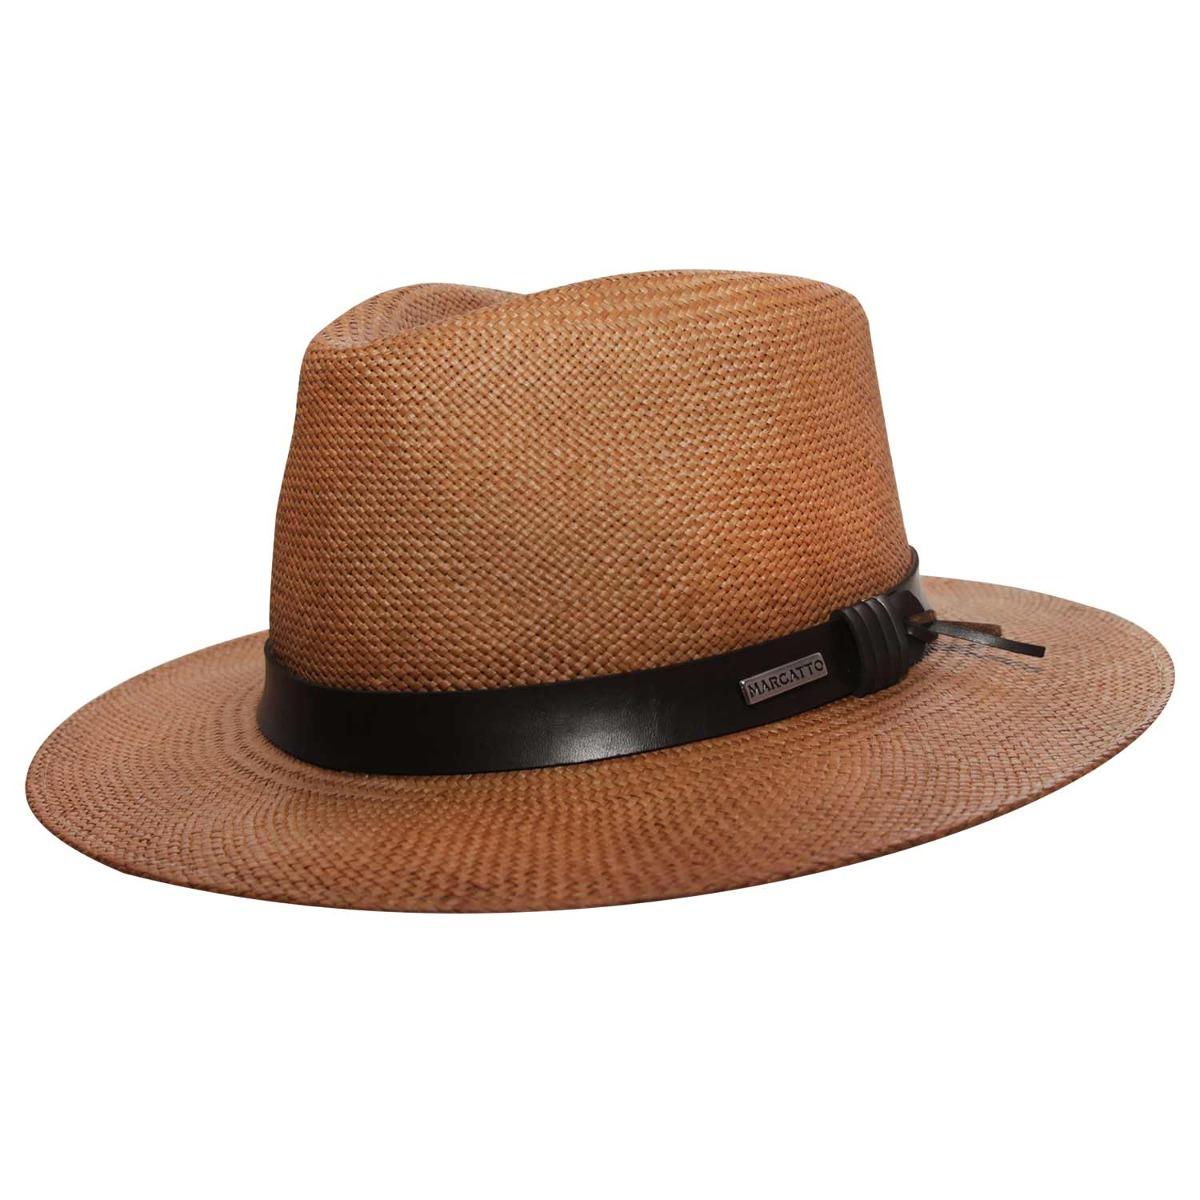 chapéu panamá antony-marrom-tamanho 56. Carregando zoom. 9b2e4d83fe7